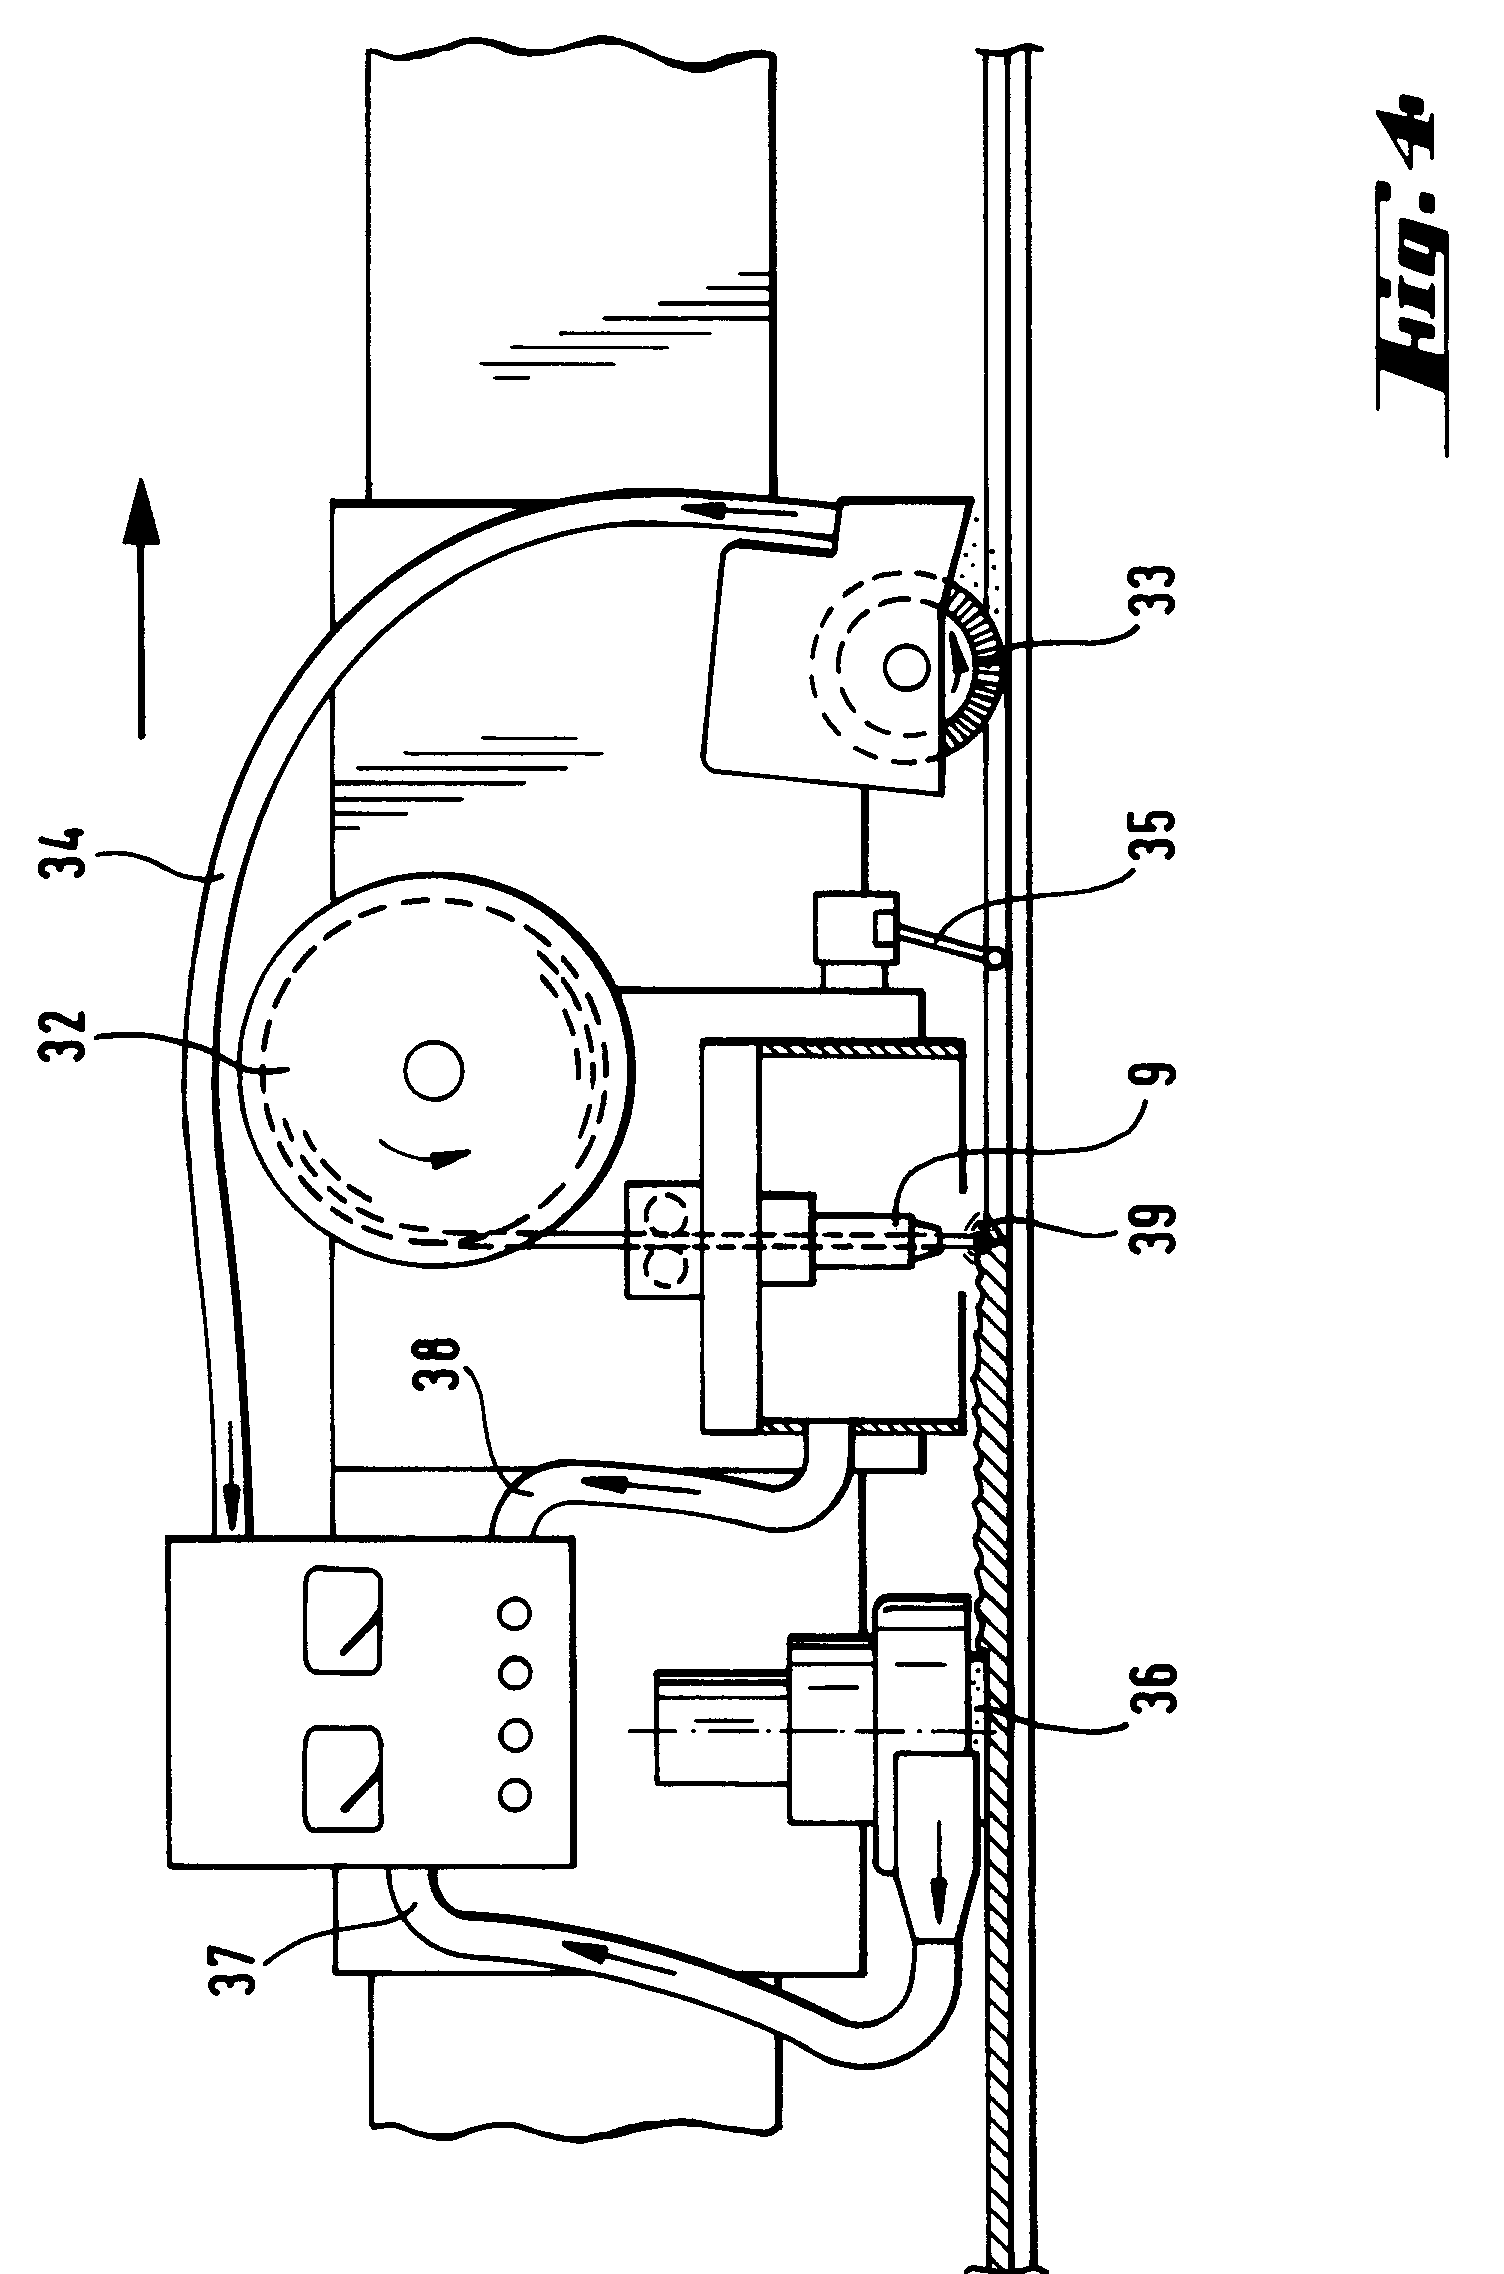 spot welding diagram wiring diagram database Miller Welder Parts List welding table plan wiring diagram database mig welder diagram spot welding diagram